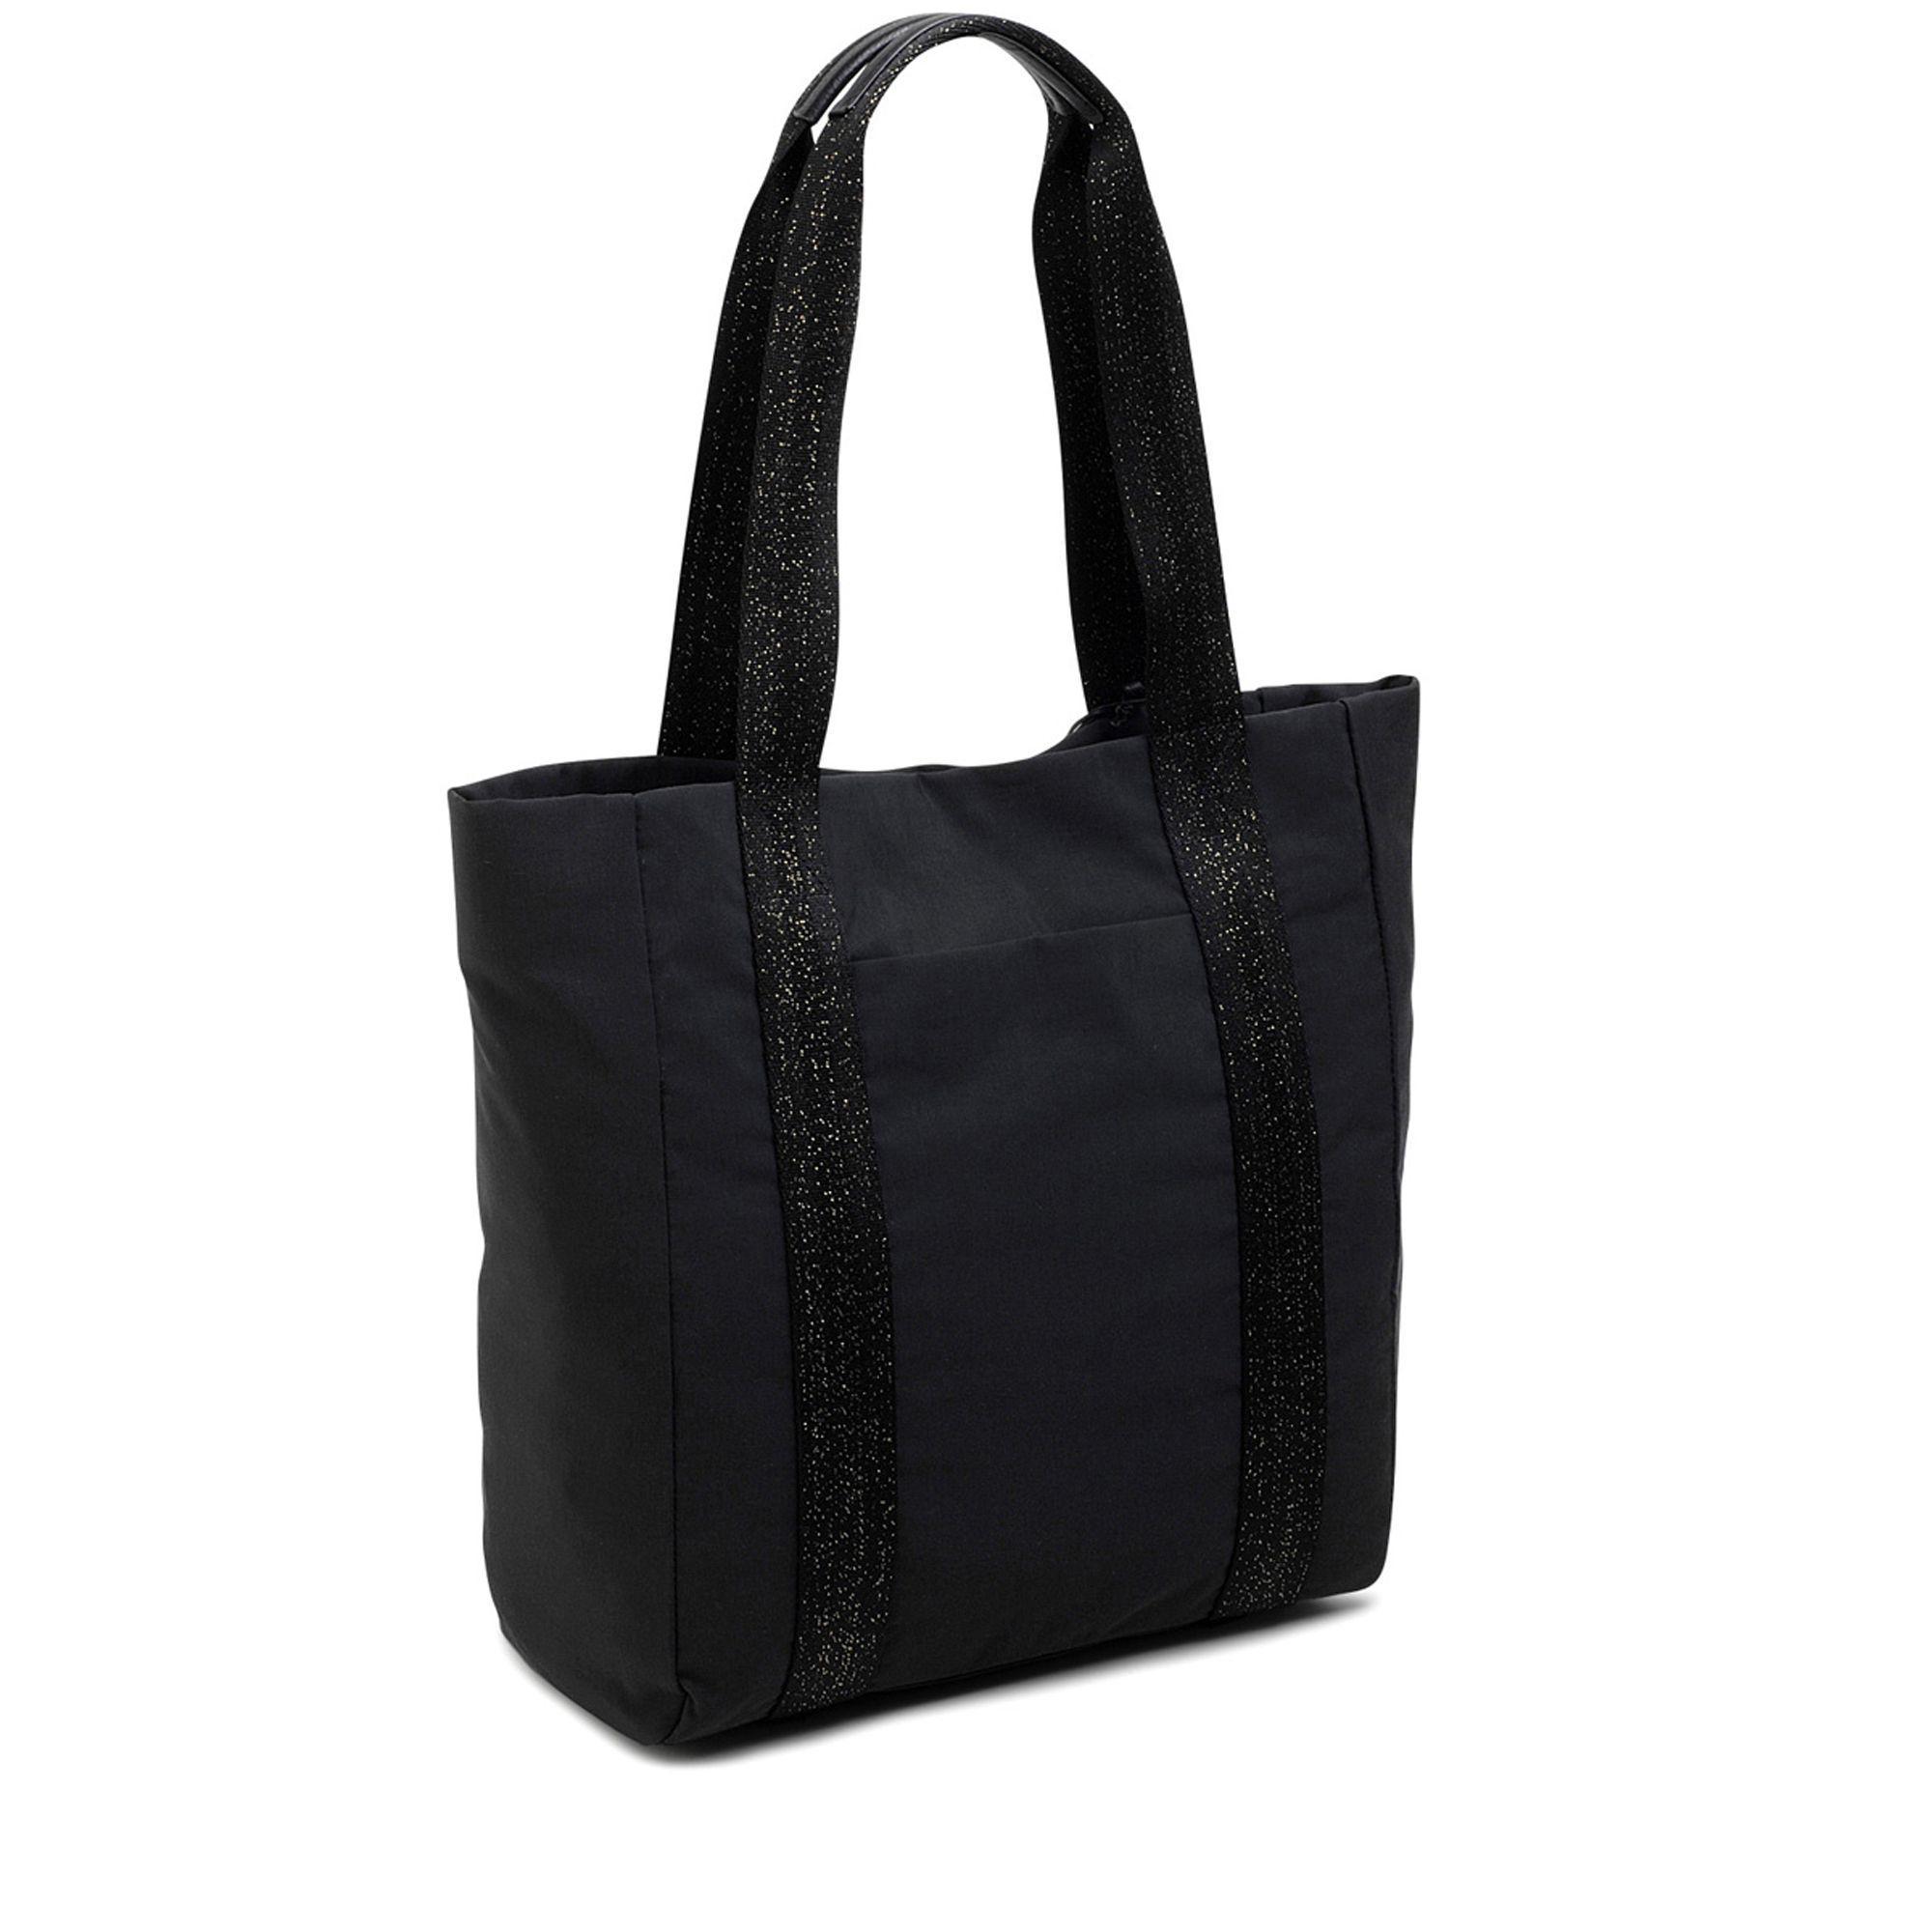 Radley Black  bell Court  Large Tote Bag in Black - Save 58% - Lyst 651c073513f4c